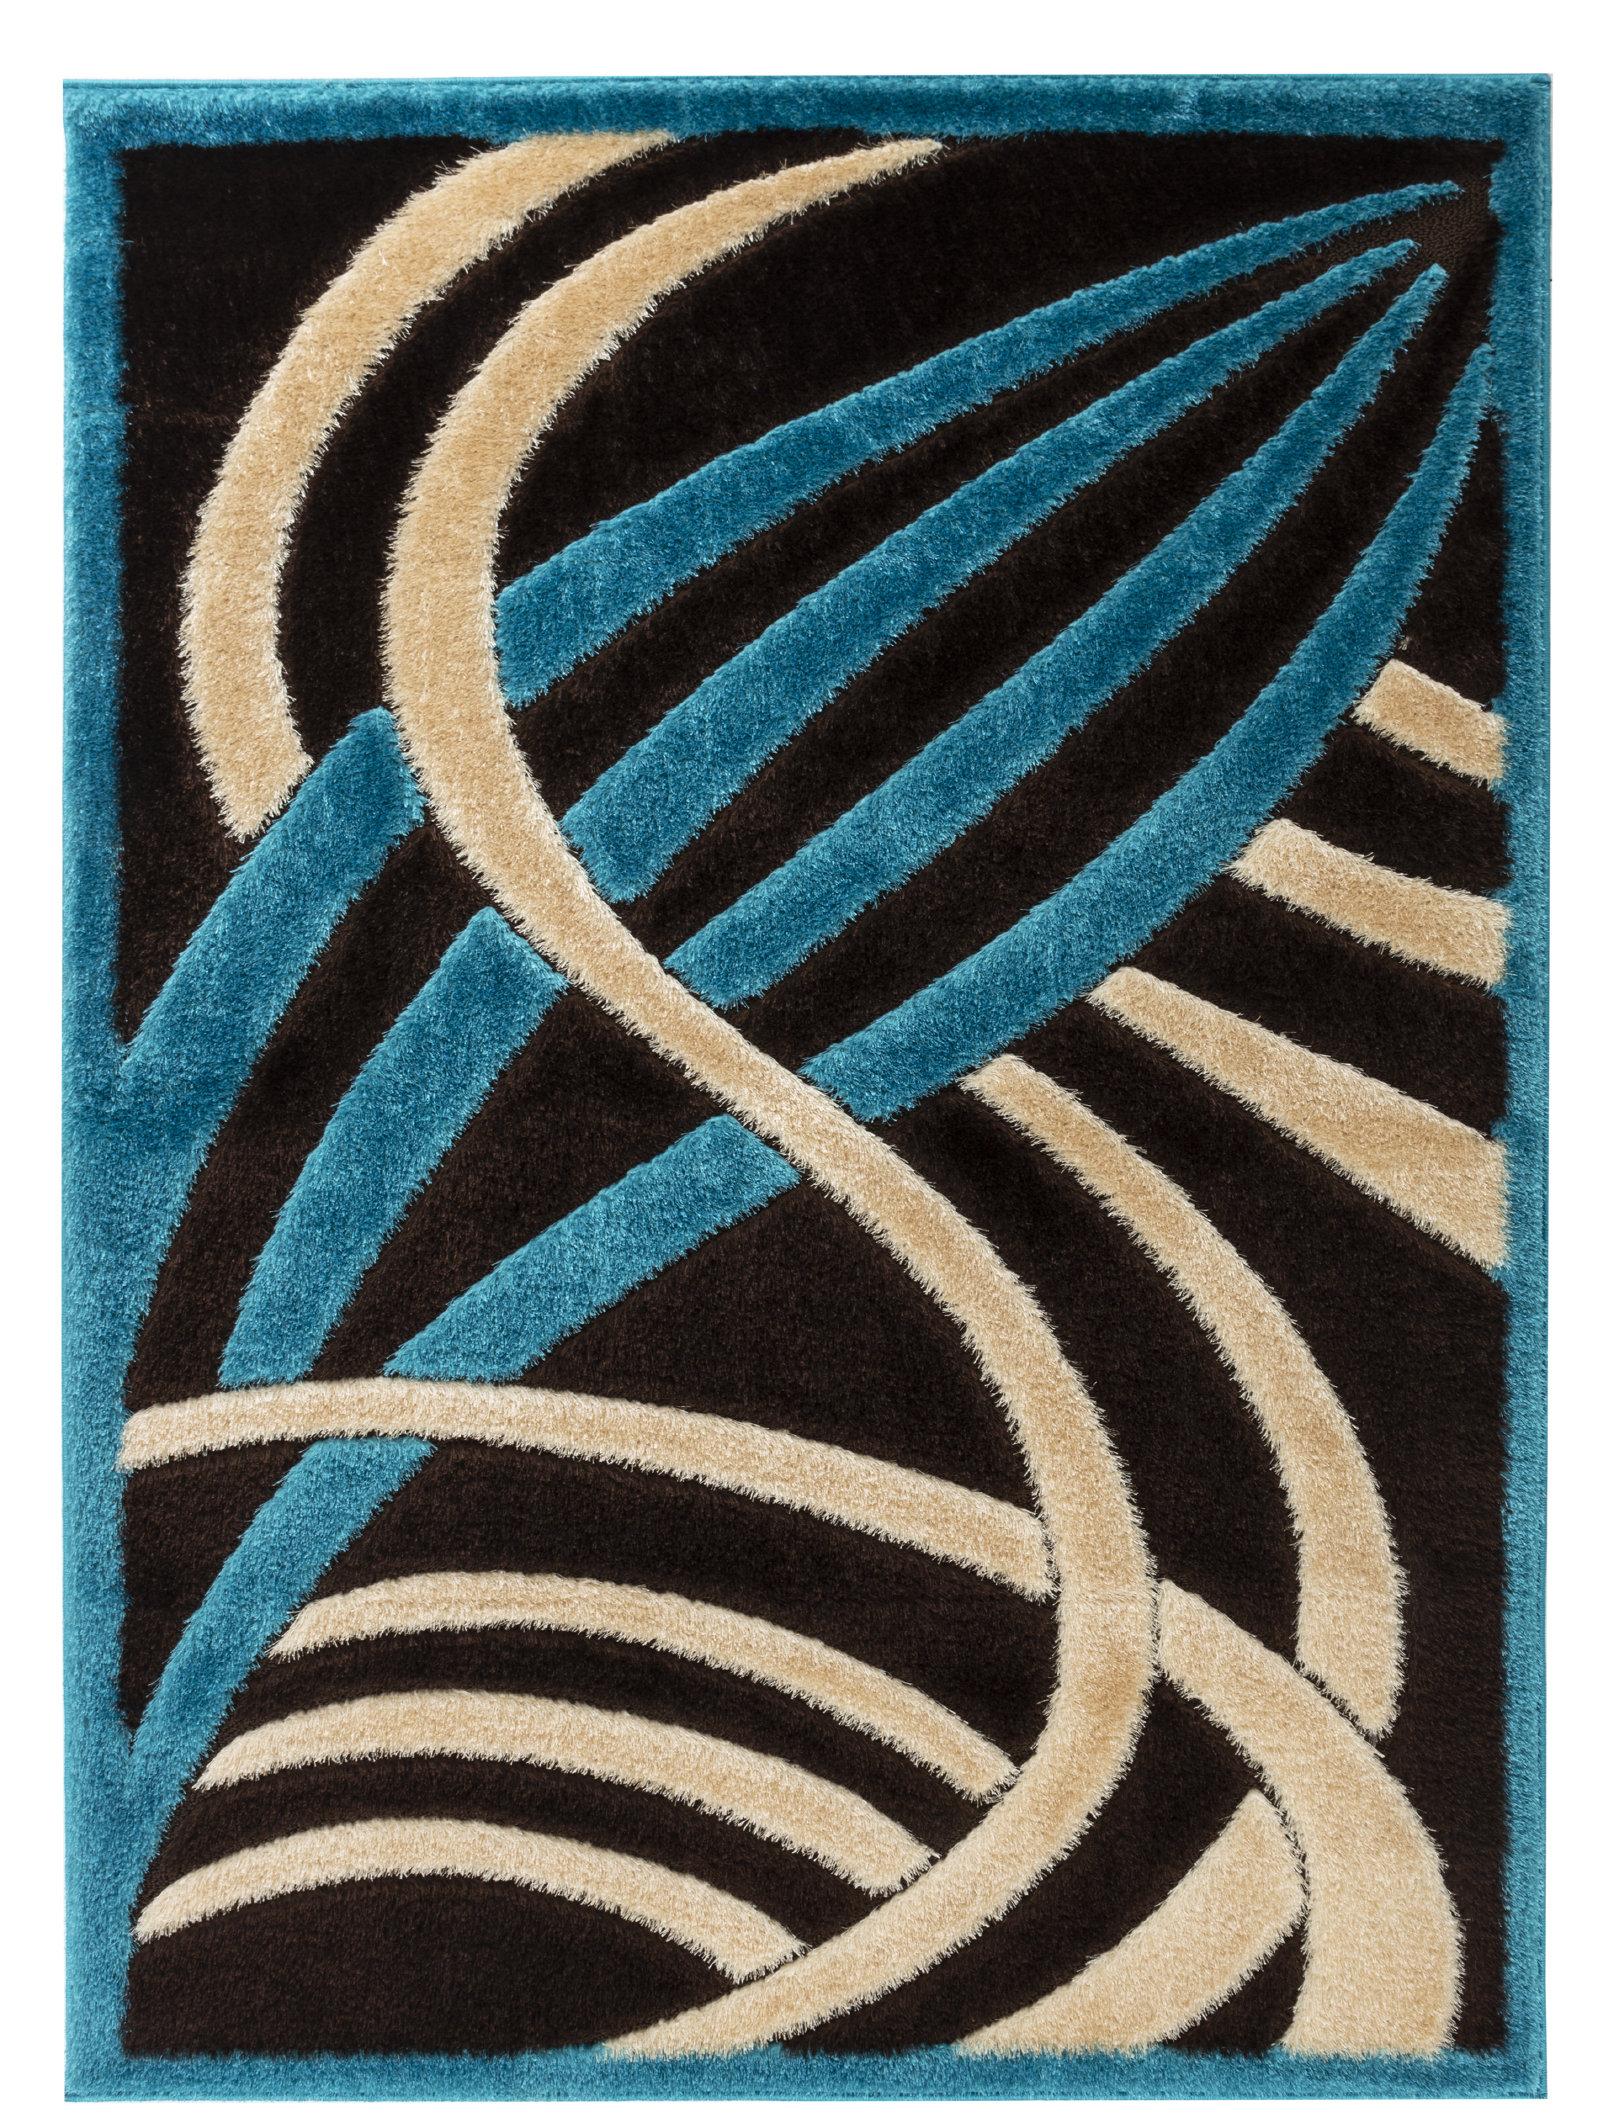 Orren Ellis Mayhew Abstract Shag Turquoise Brown Area Rug